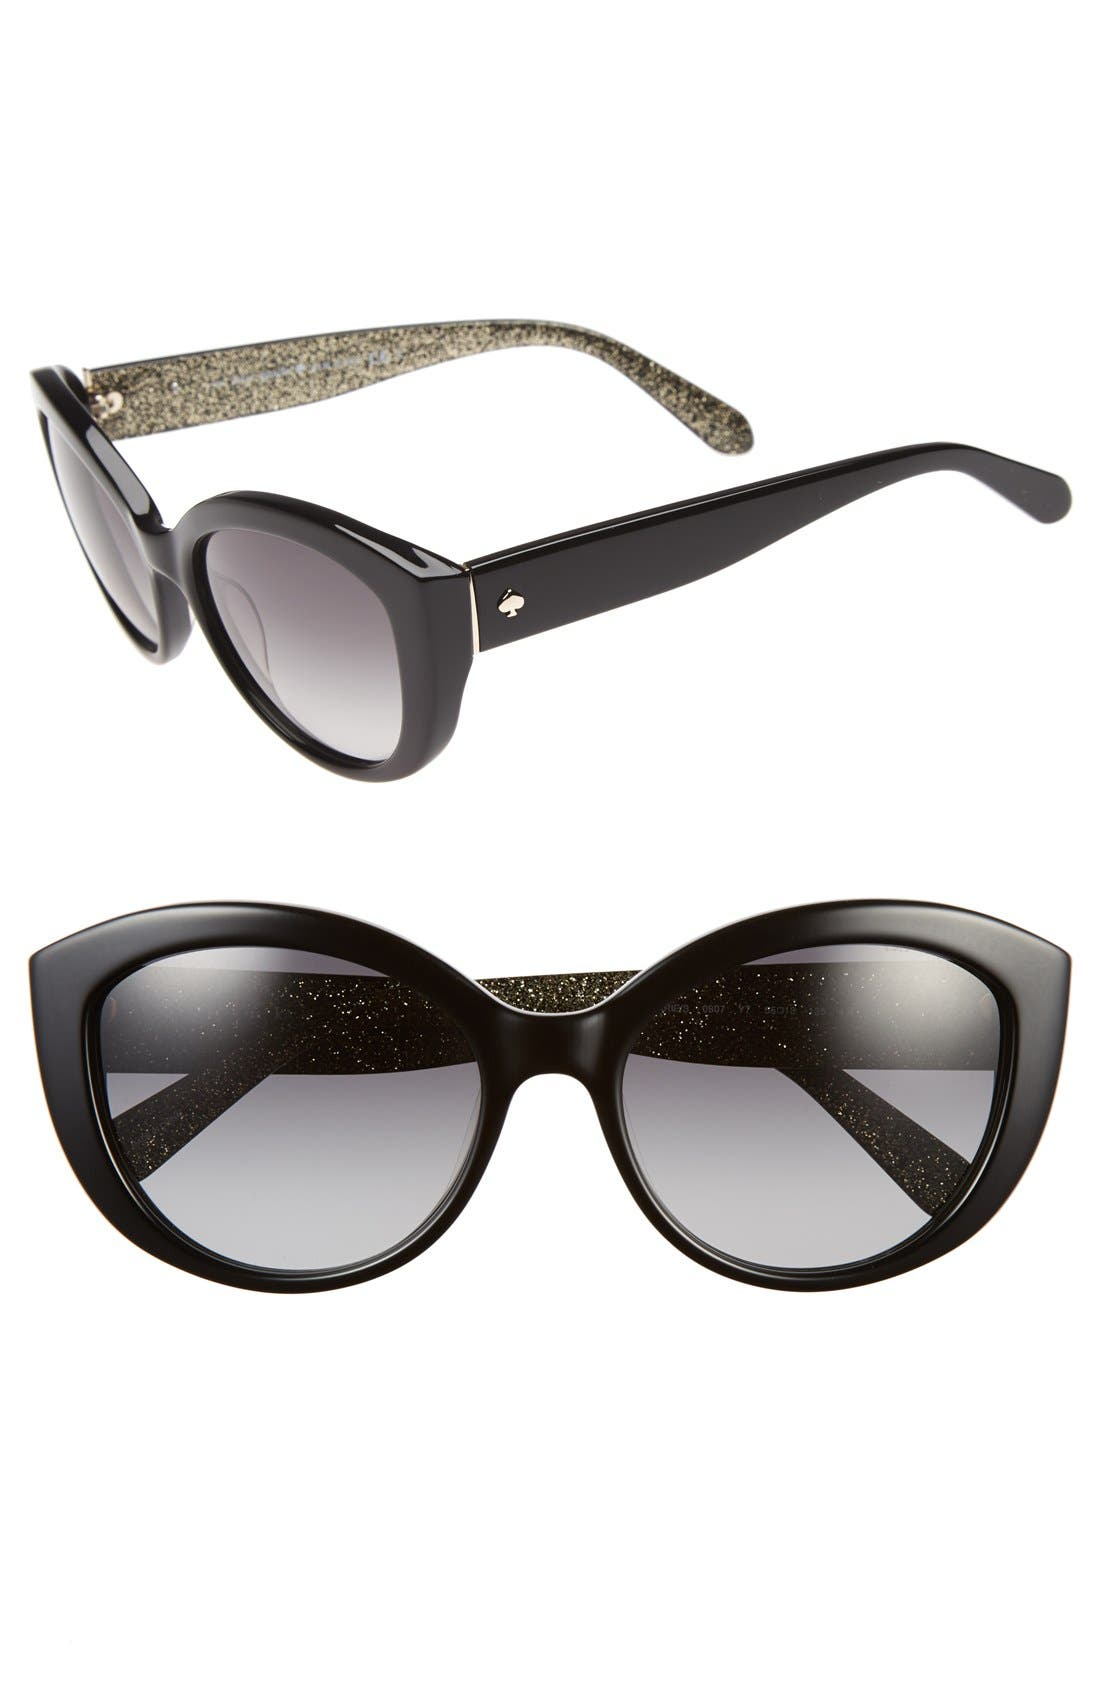 Alternate Image 1 Selected - kate spade new york 'sherrie' 55mm cat eye sunglasses